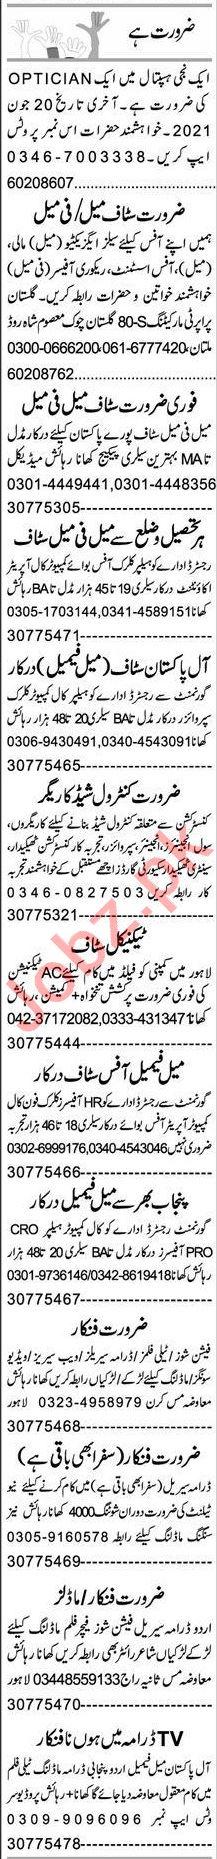 Express Sunday Multan Classified Ads 13 June 2021